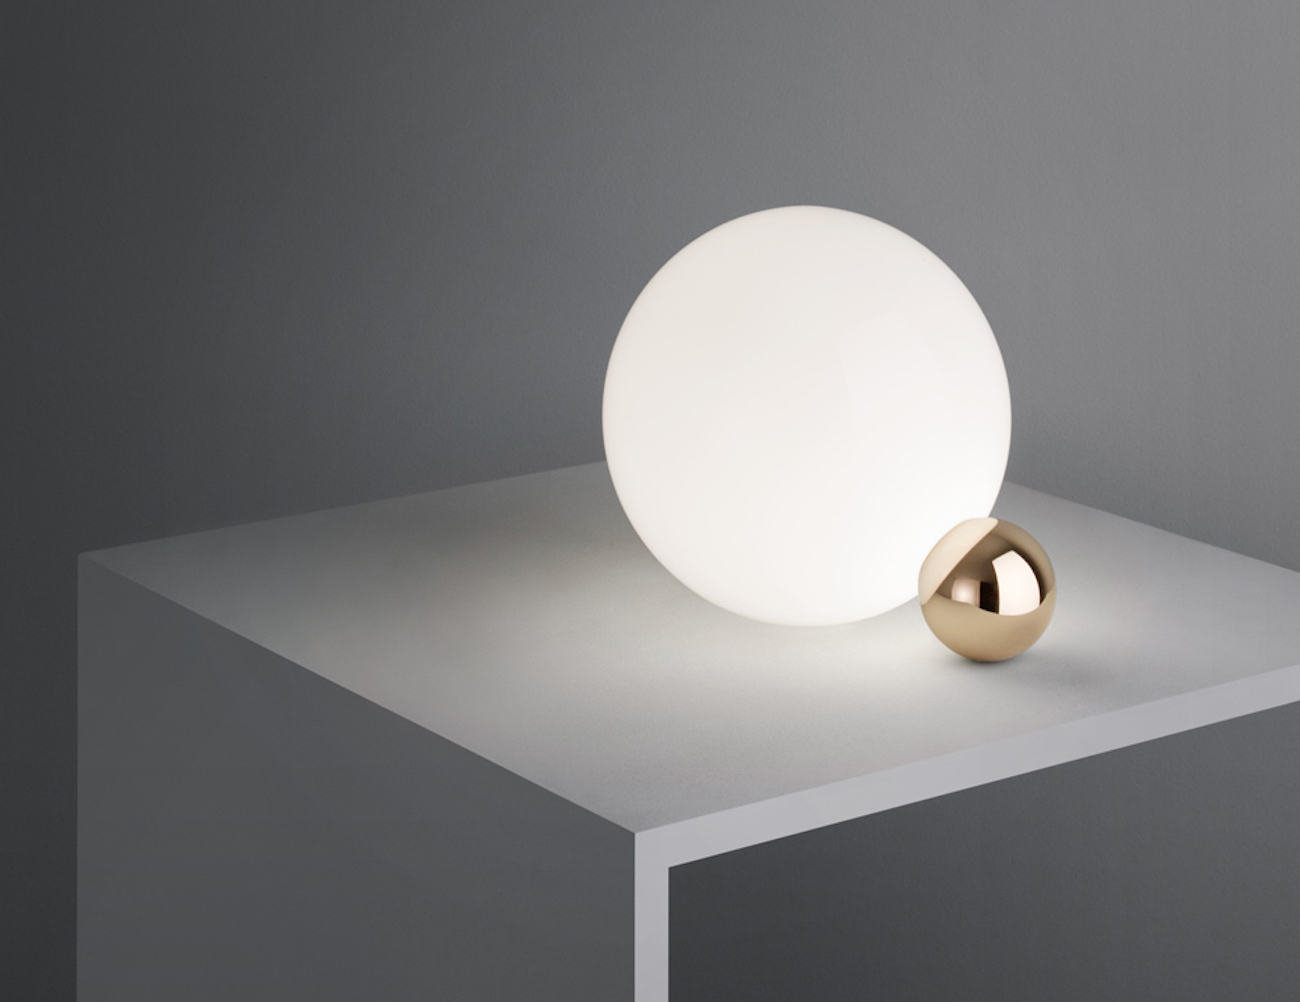 Copycat Table Lamp by Flos » Gadget Flow